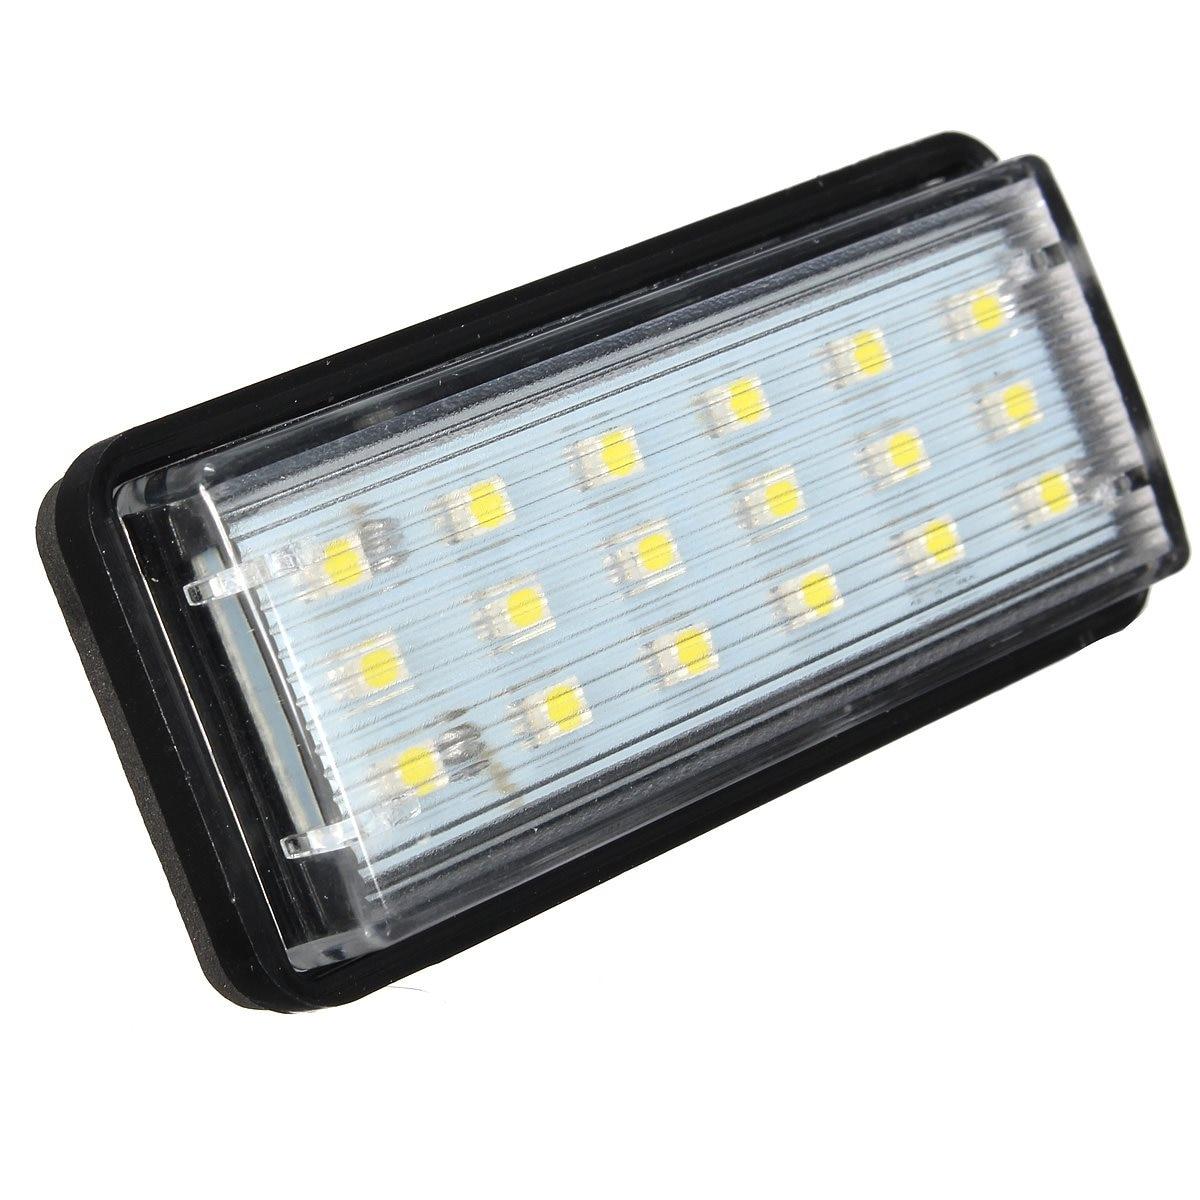 2x Error Free LED SMD License Plate Light For Toyota/Land/Cruiser/Lexus/GX LX470 2pcs error free led smd license plate light for toyota land cruiser lexus gx lx470 new dropping shipping